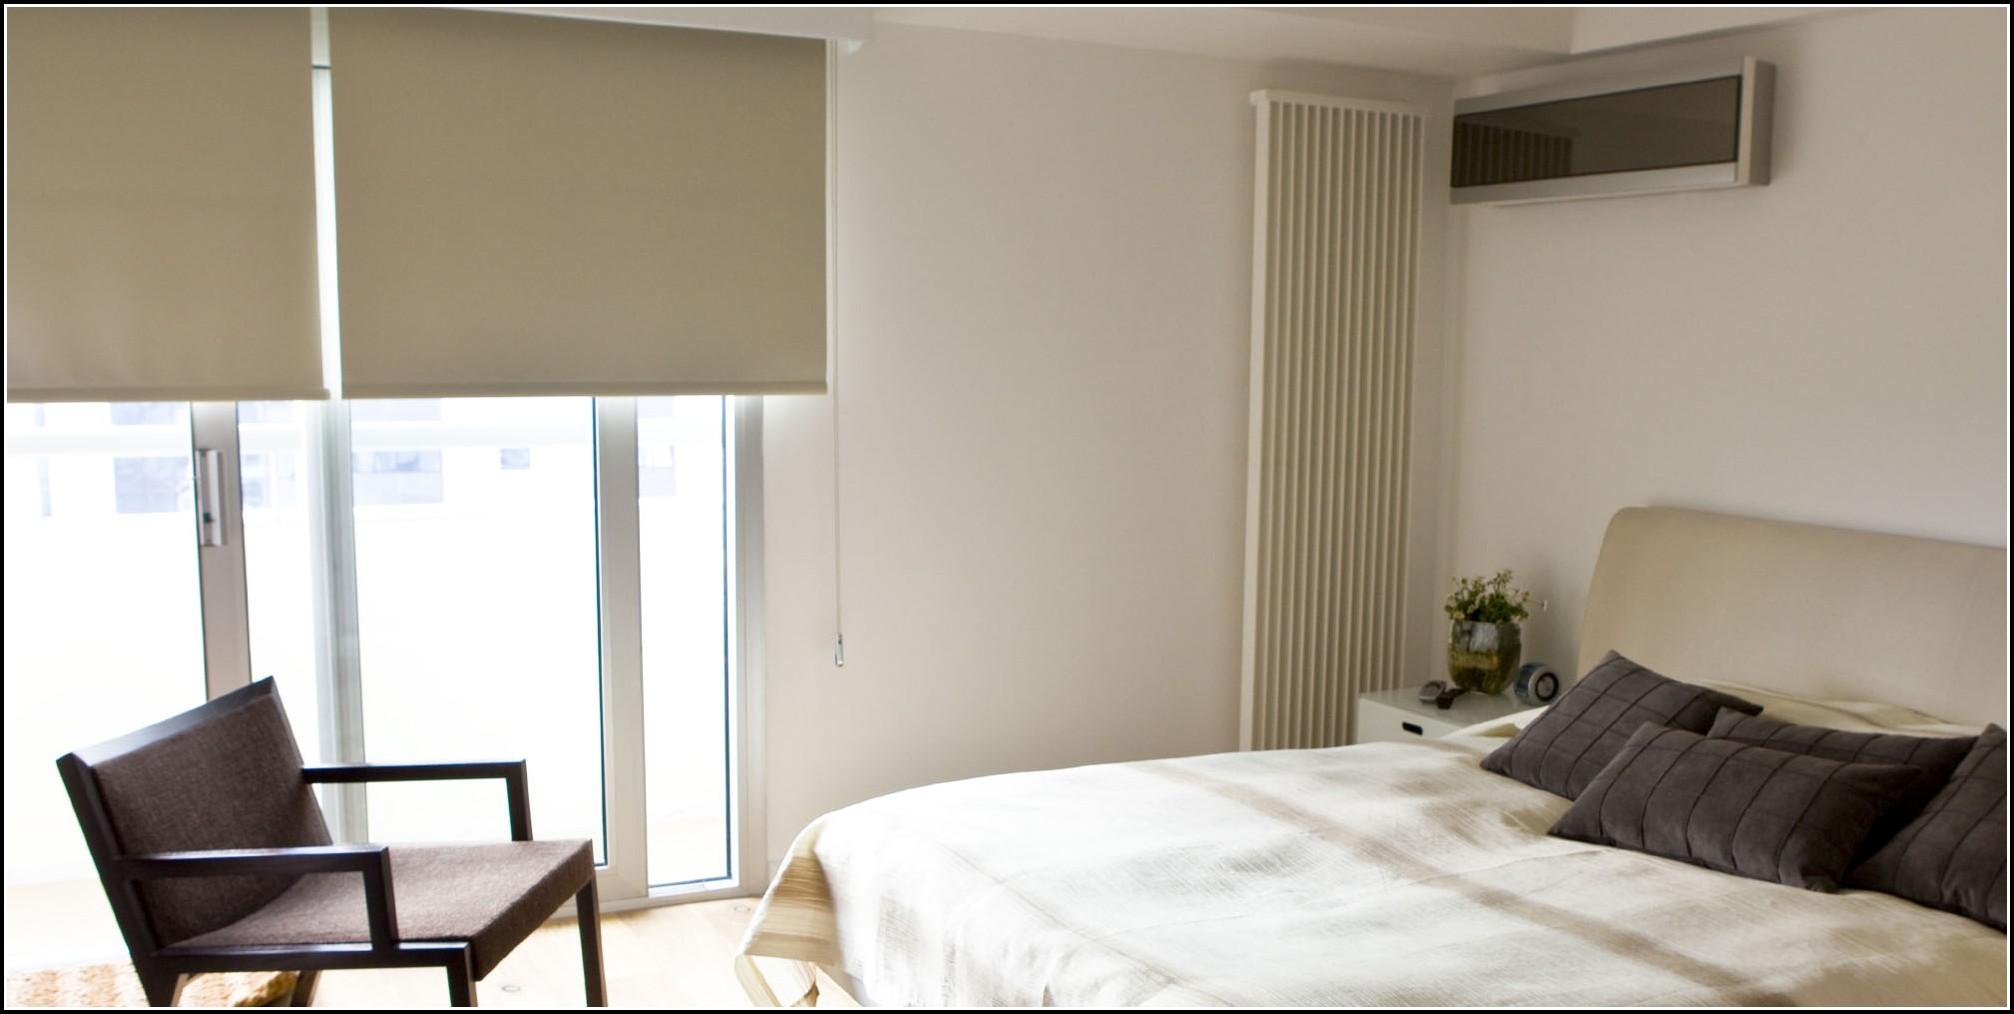 klimaanlage fensteradapter smartstore. Black Bedroom Furniture Sets. Home Design Ideas